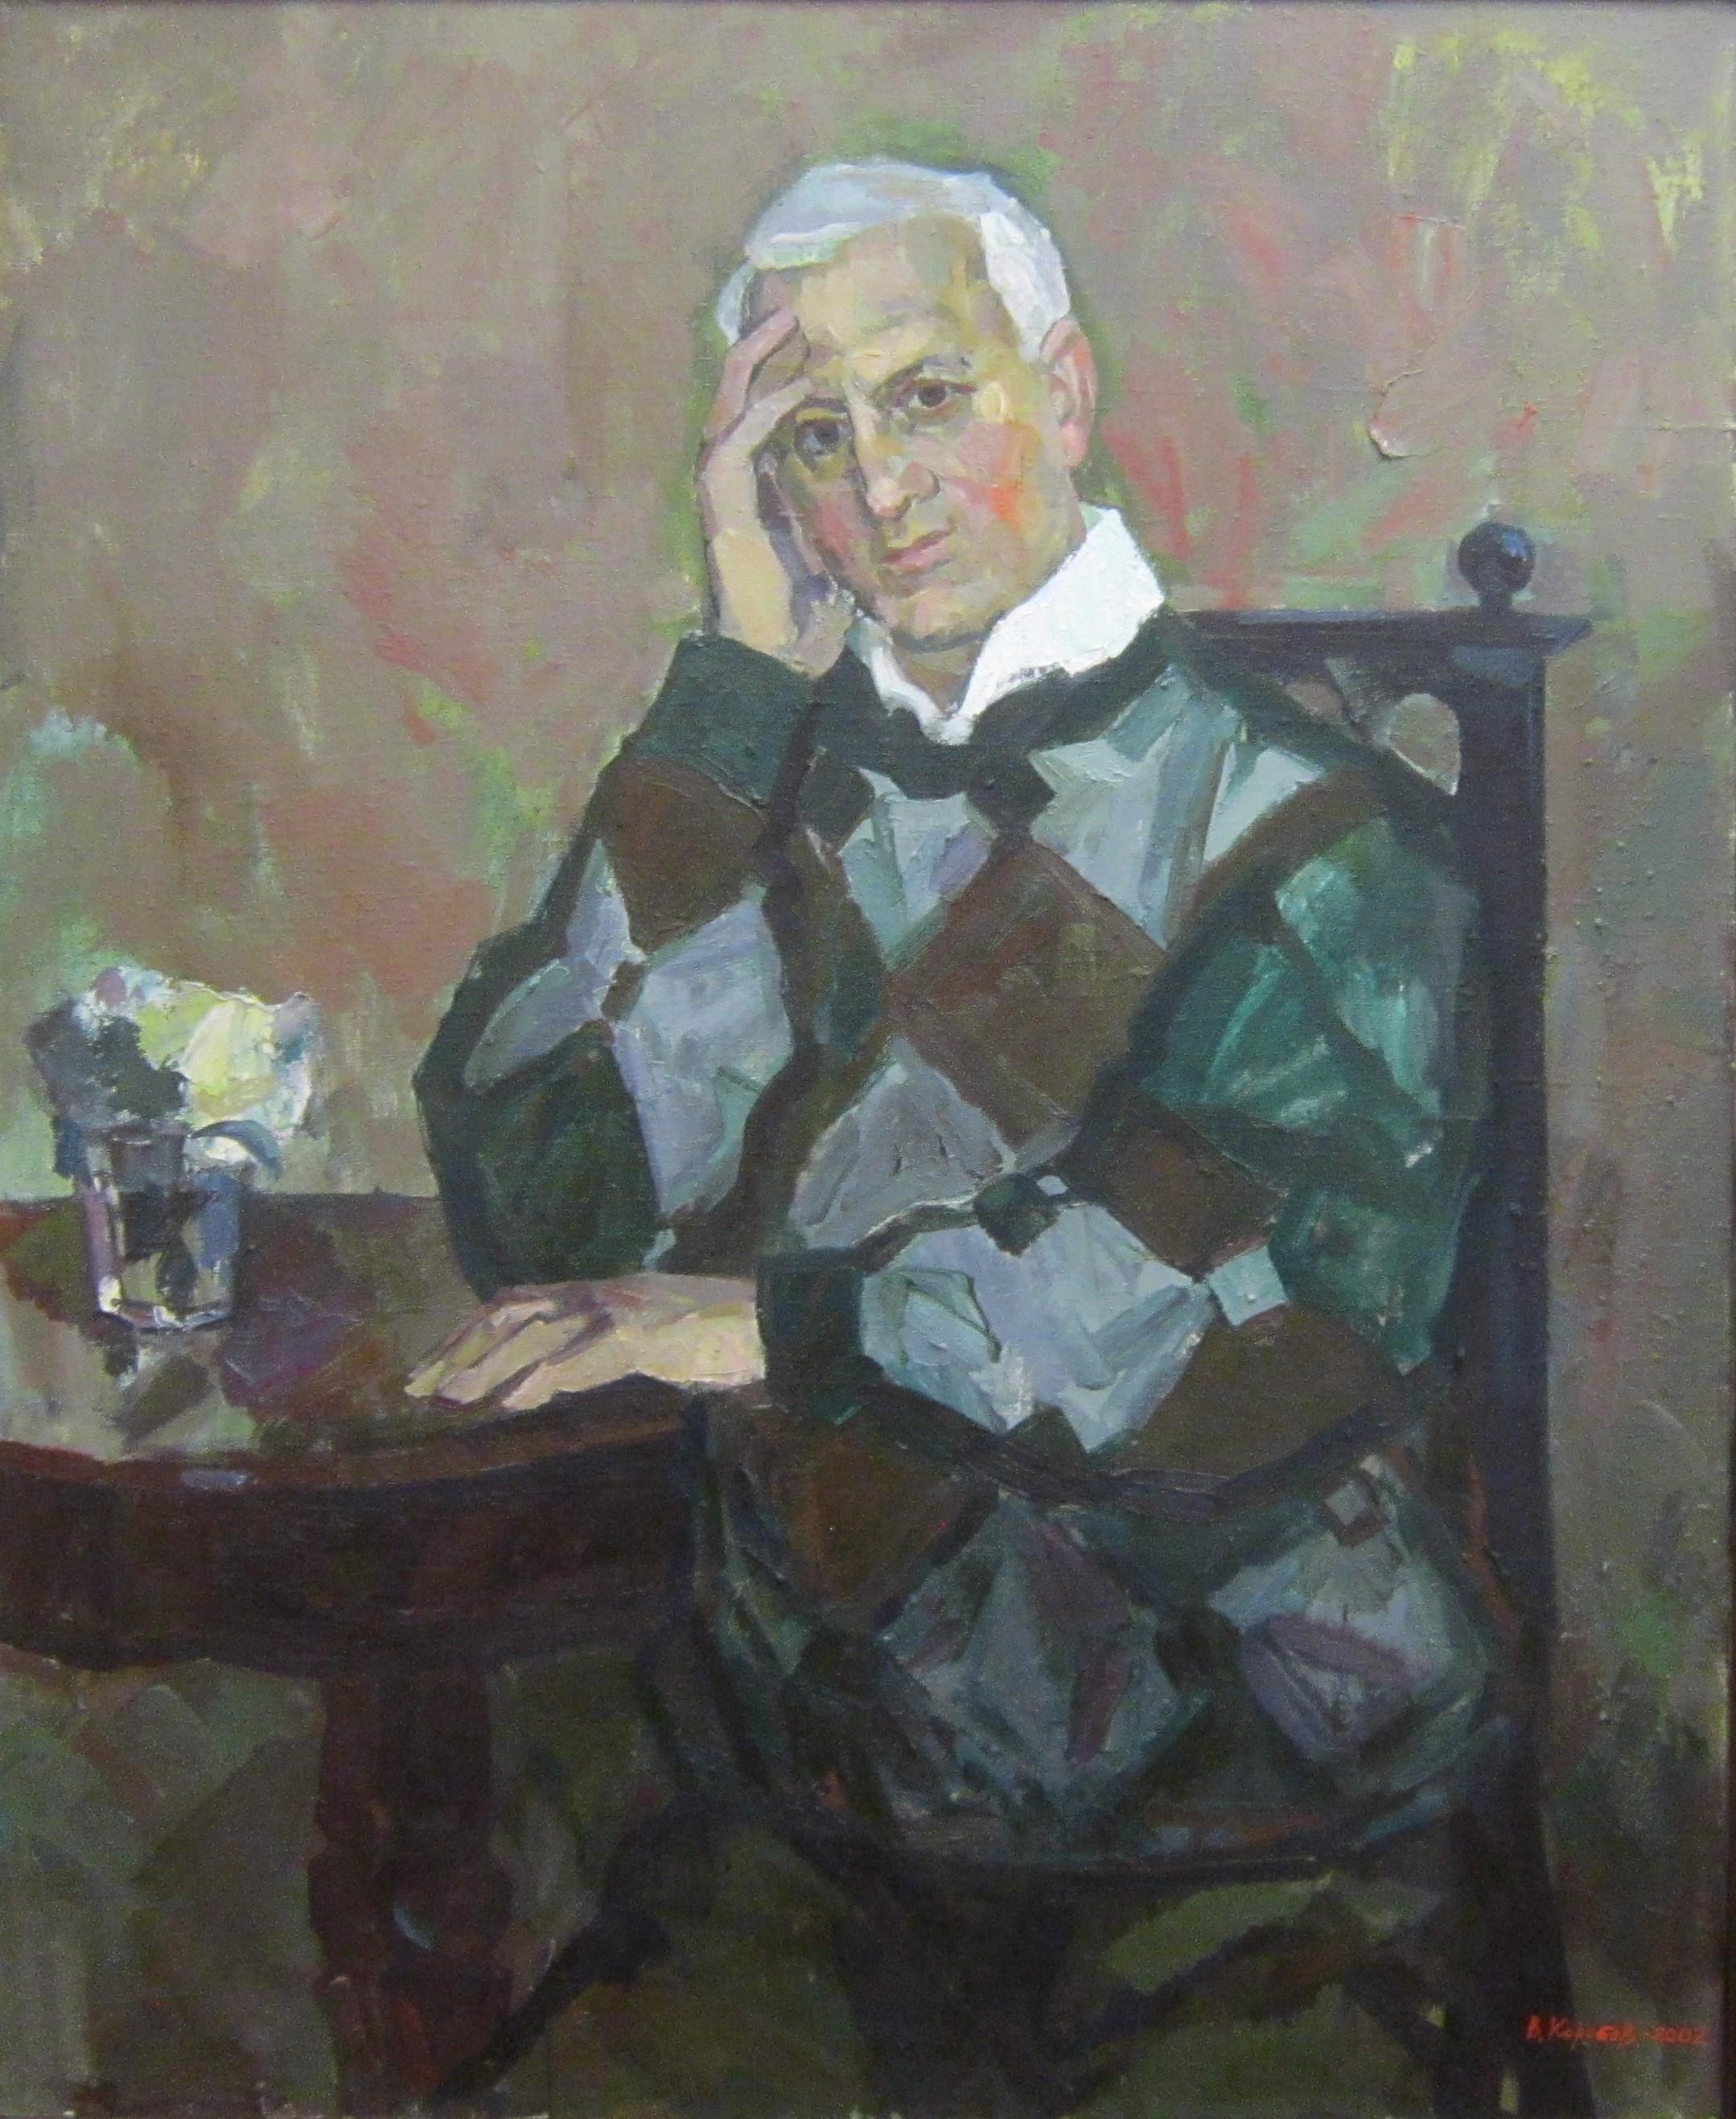 Виталий Фёдорович Коробов (род. в 1937 году). Автопортрет. 2002 год.